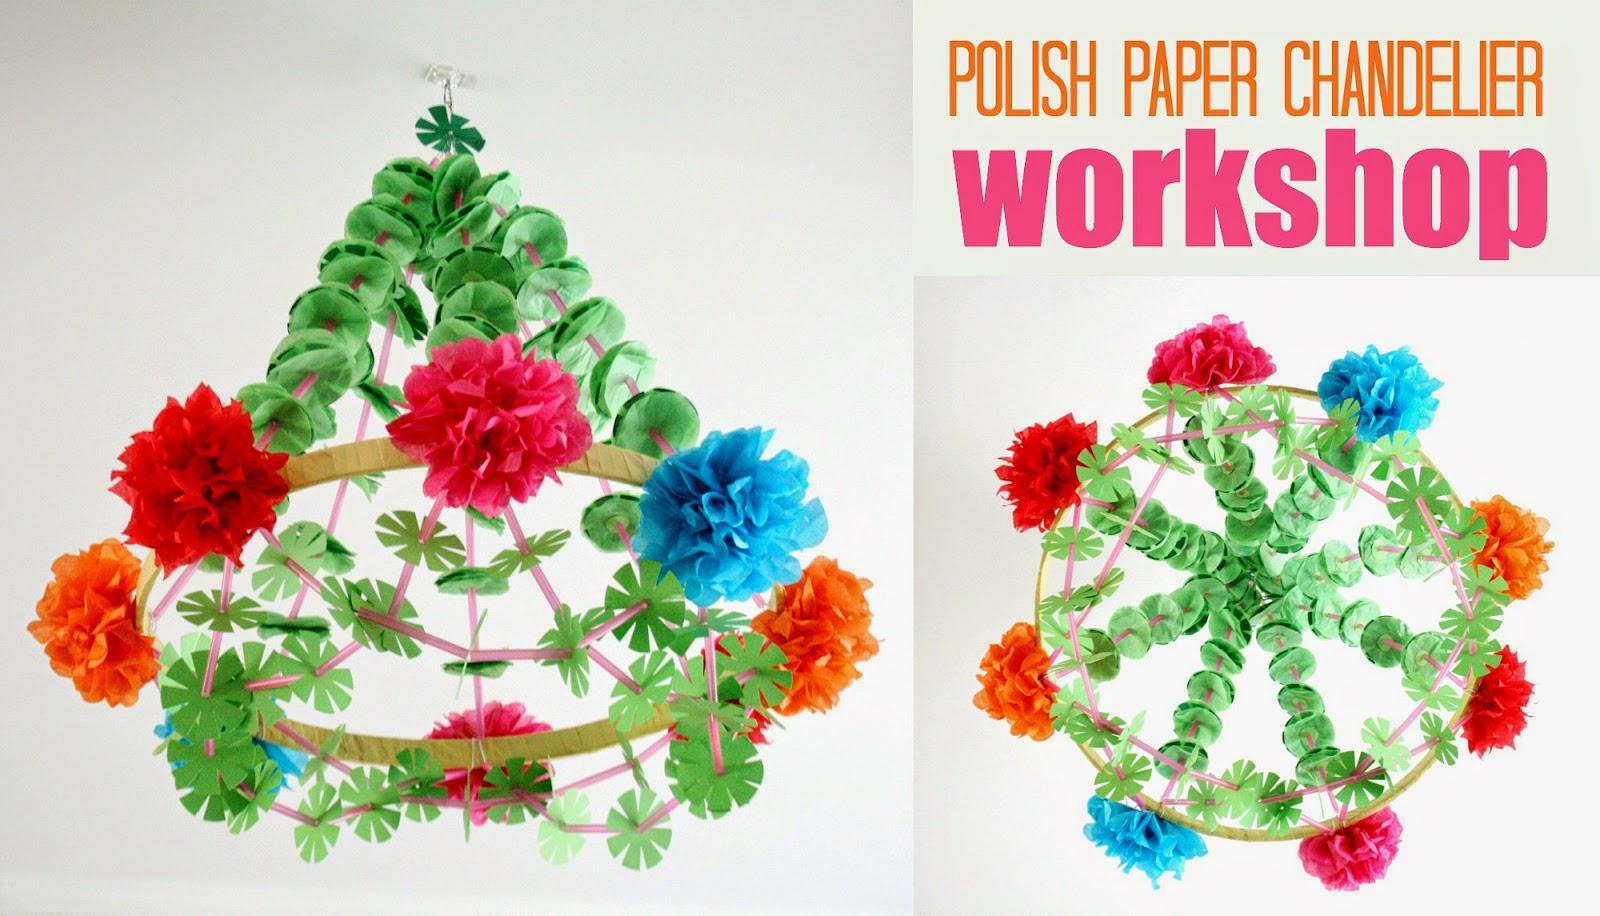 The craft revival pajaki polish paper chandelier workshop pajaki polish paper chandelier workshop arubaitofo Choice Image